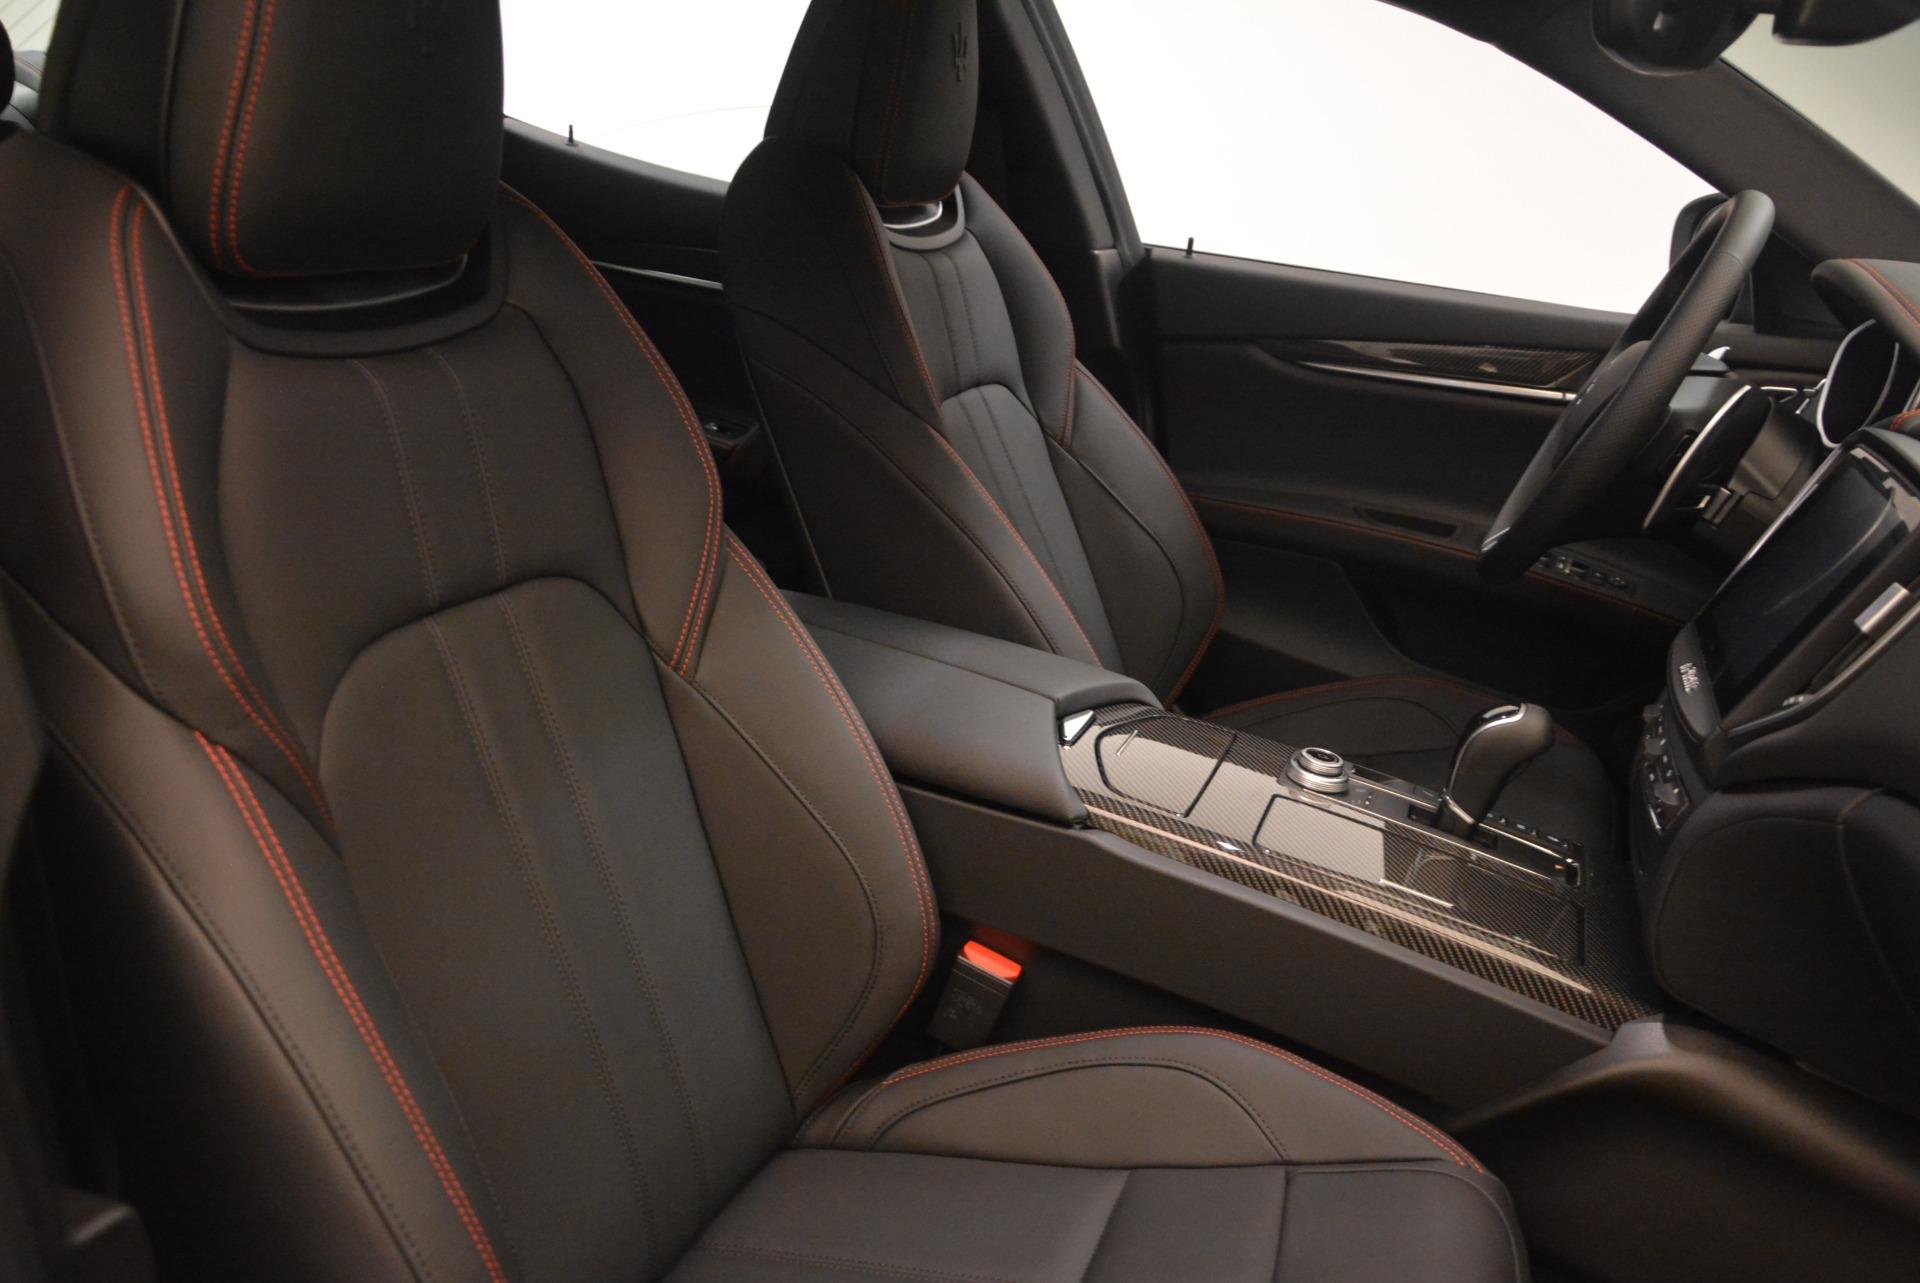 New 2018 Maserati Ghibli SQ4 GranSport Nerissimo For Sale In Westport, CT 2278_p18